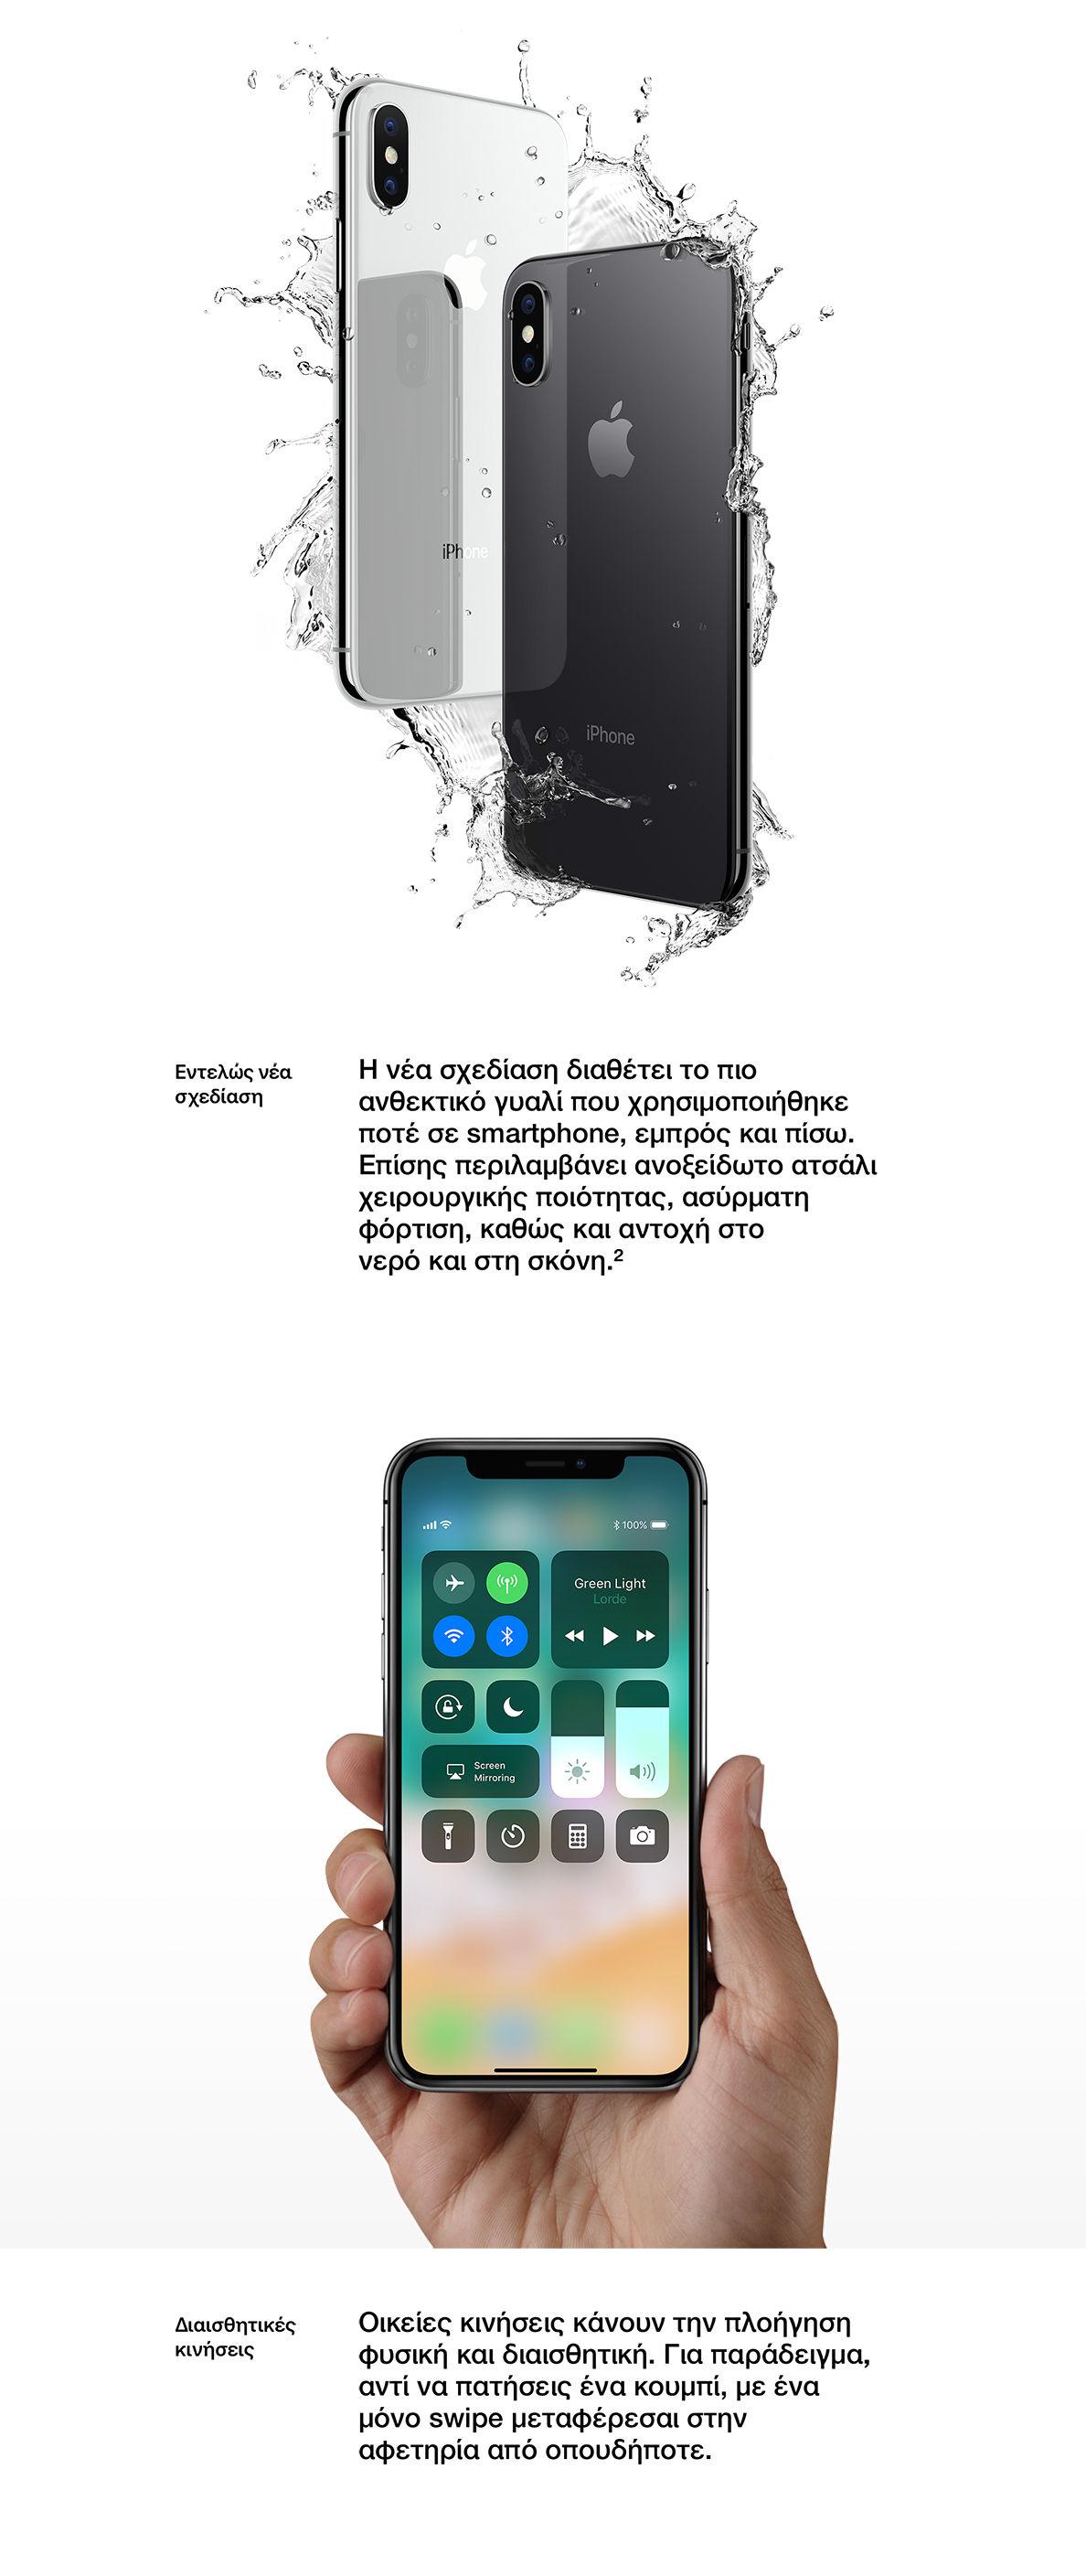 iPhonex-agora-Ellada-Mediamarkt-public-kotsovolos-germanos-iPhoneX-diathesimo-gia-paraggelia-november-2017 (4)